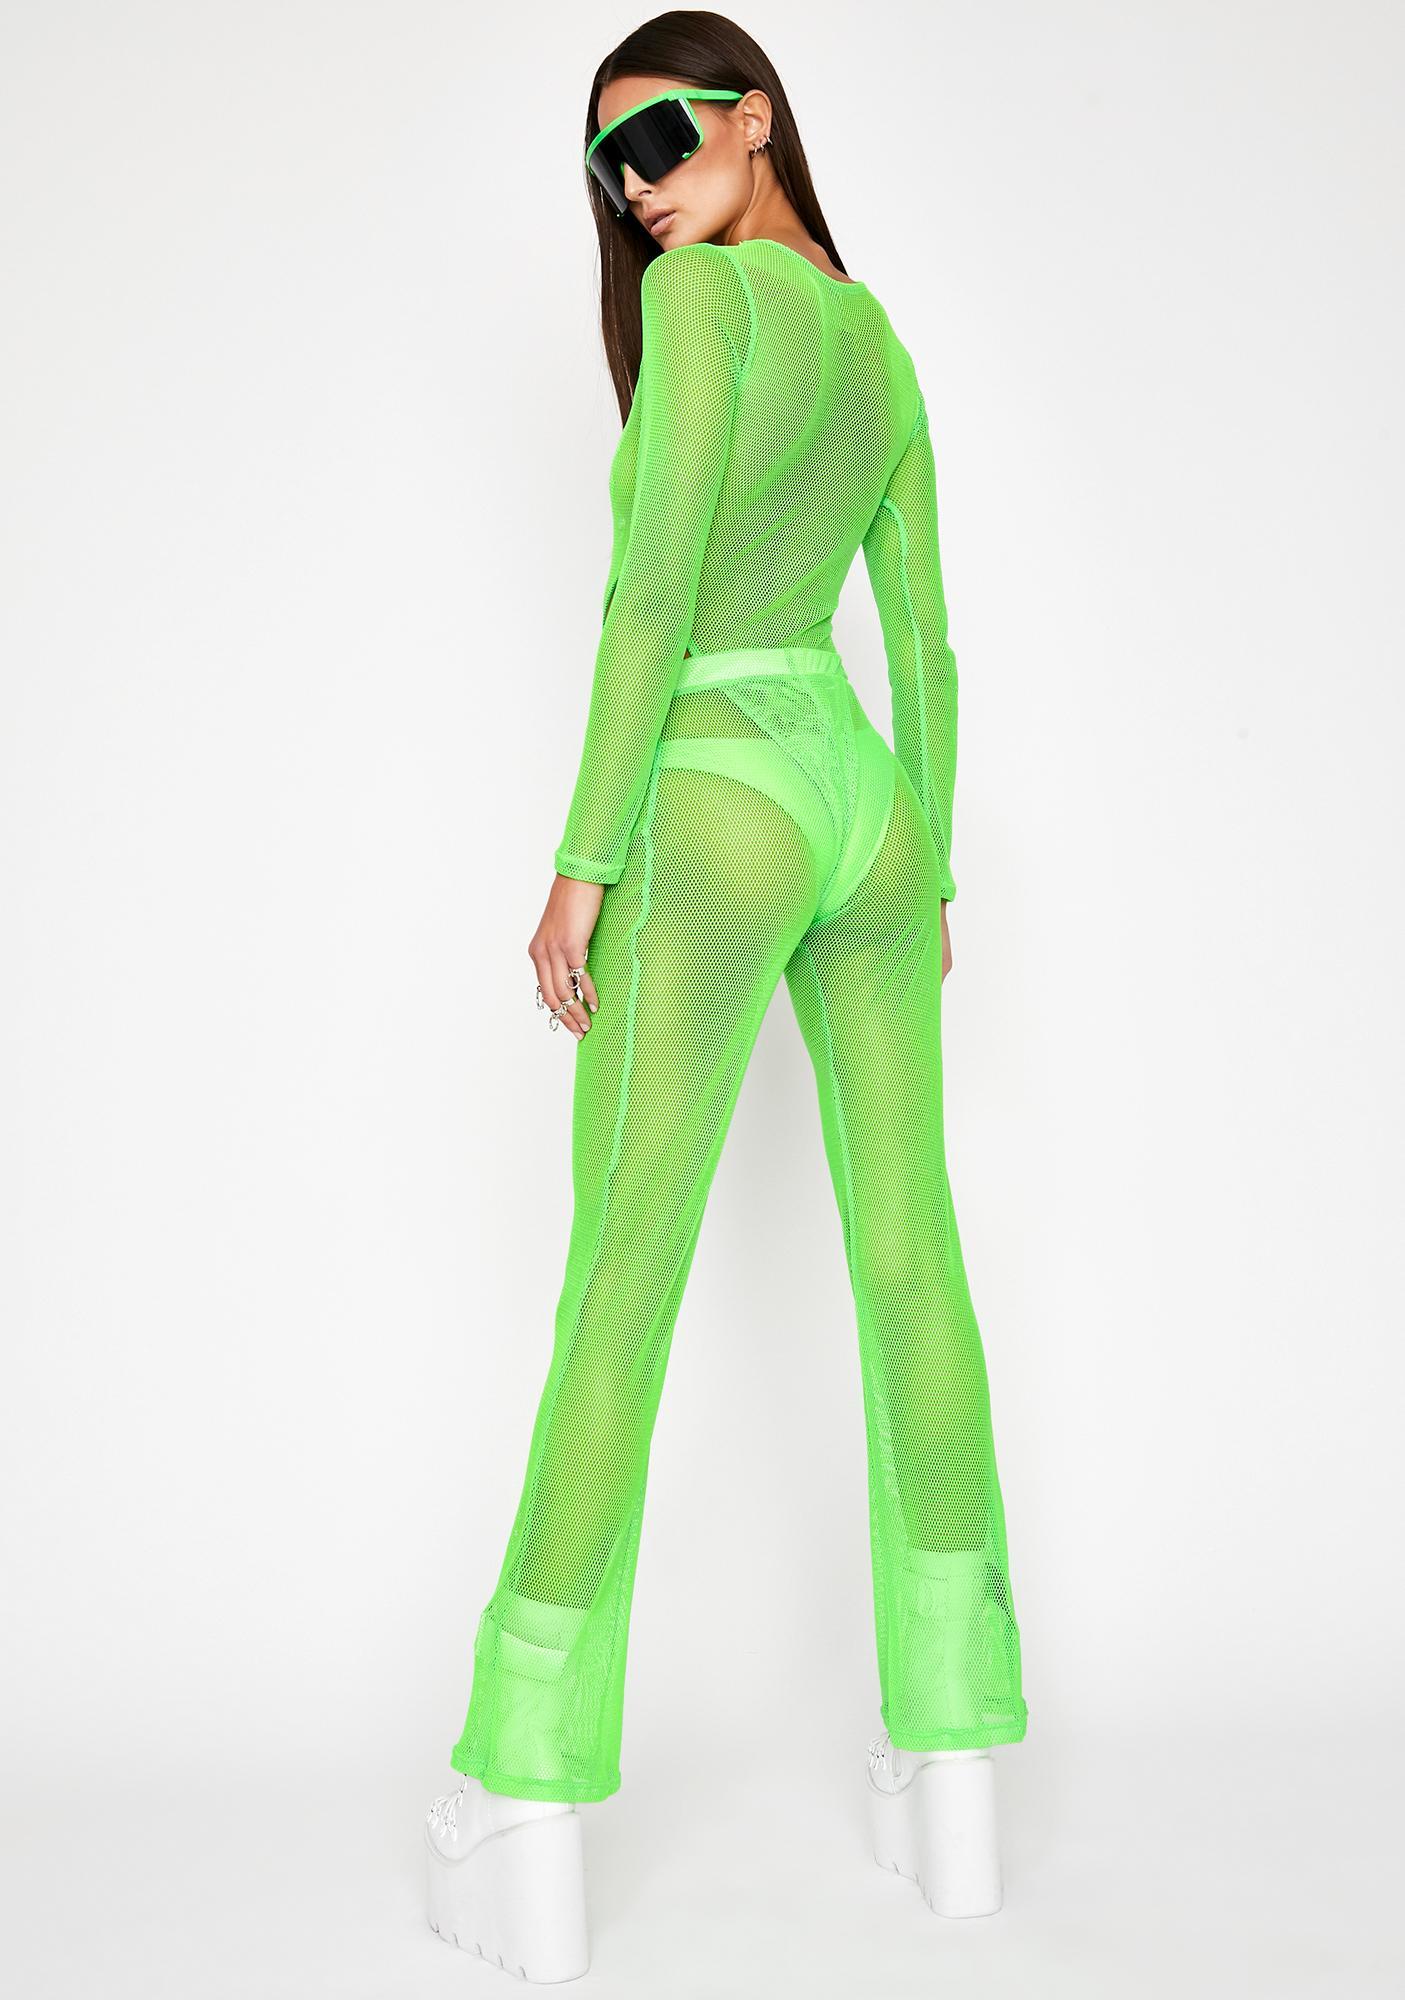 Slime Infinite Illusion Mesh Flares